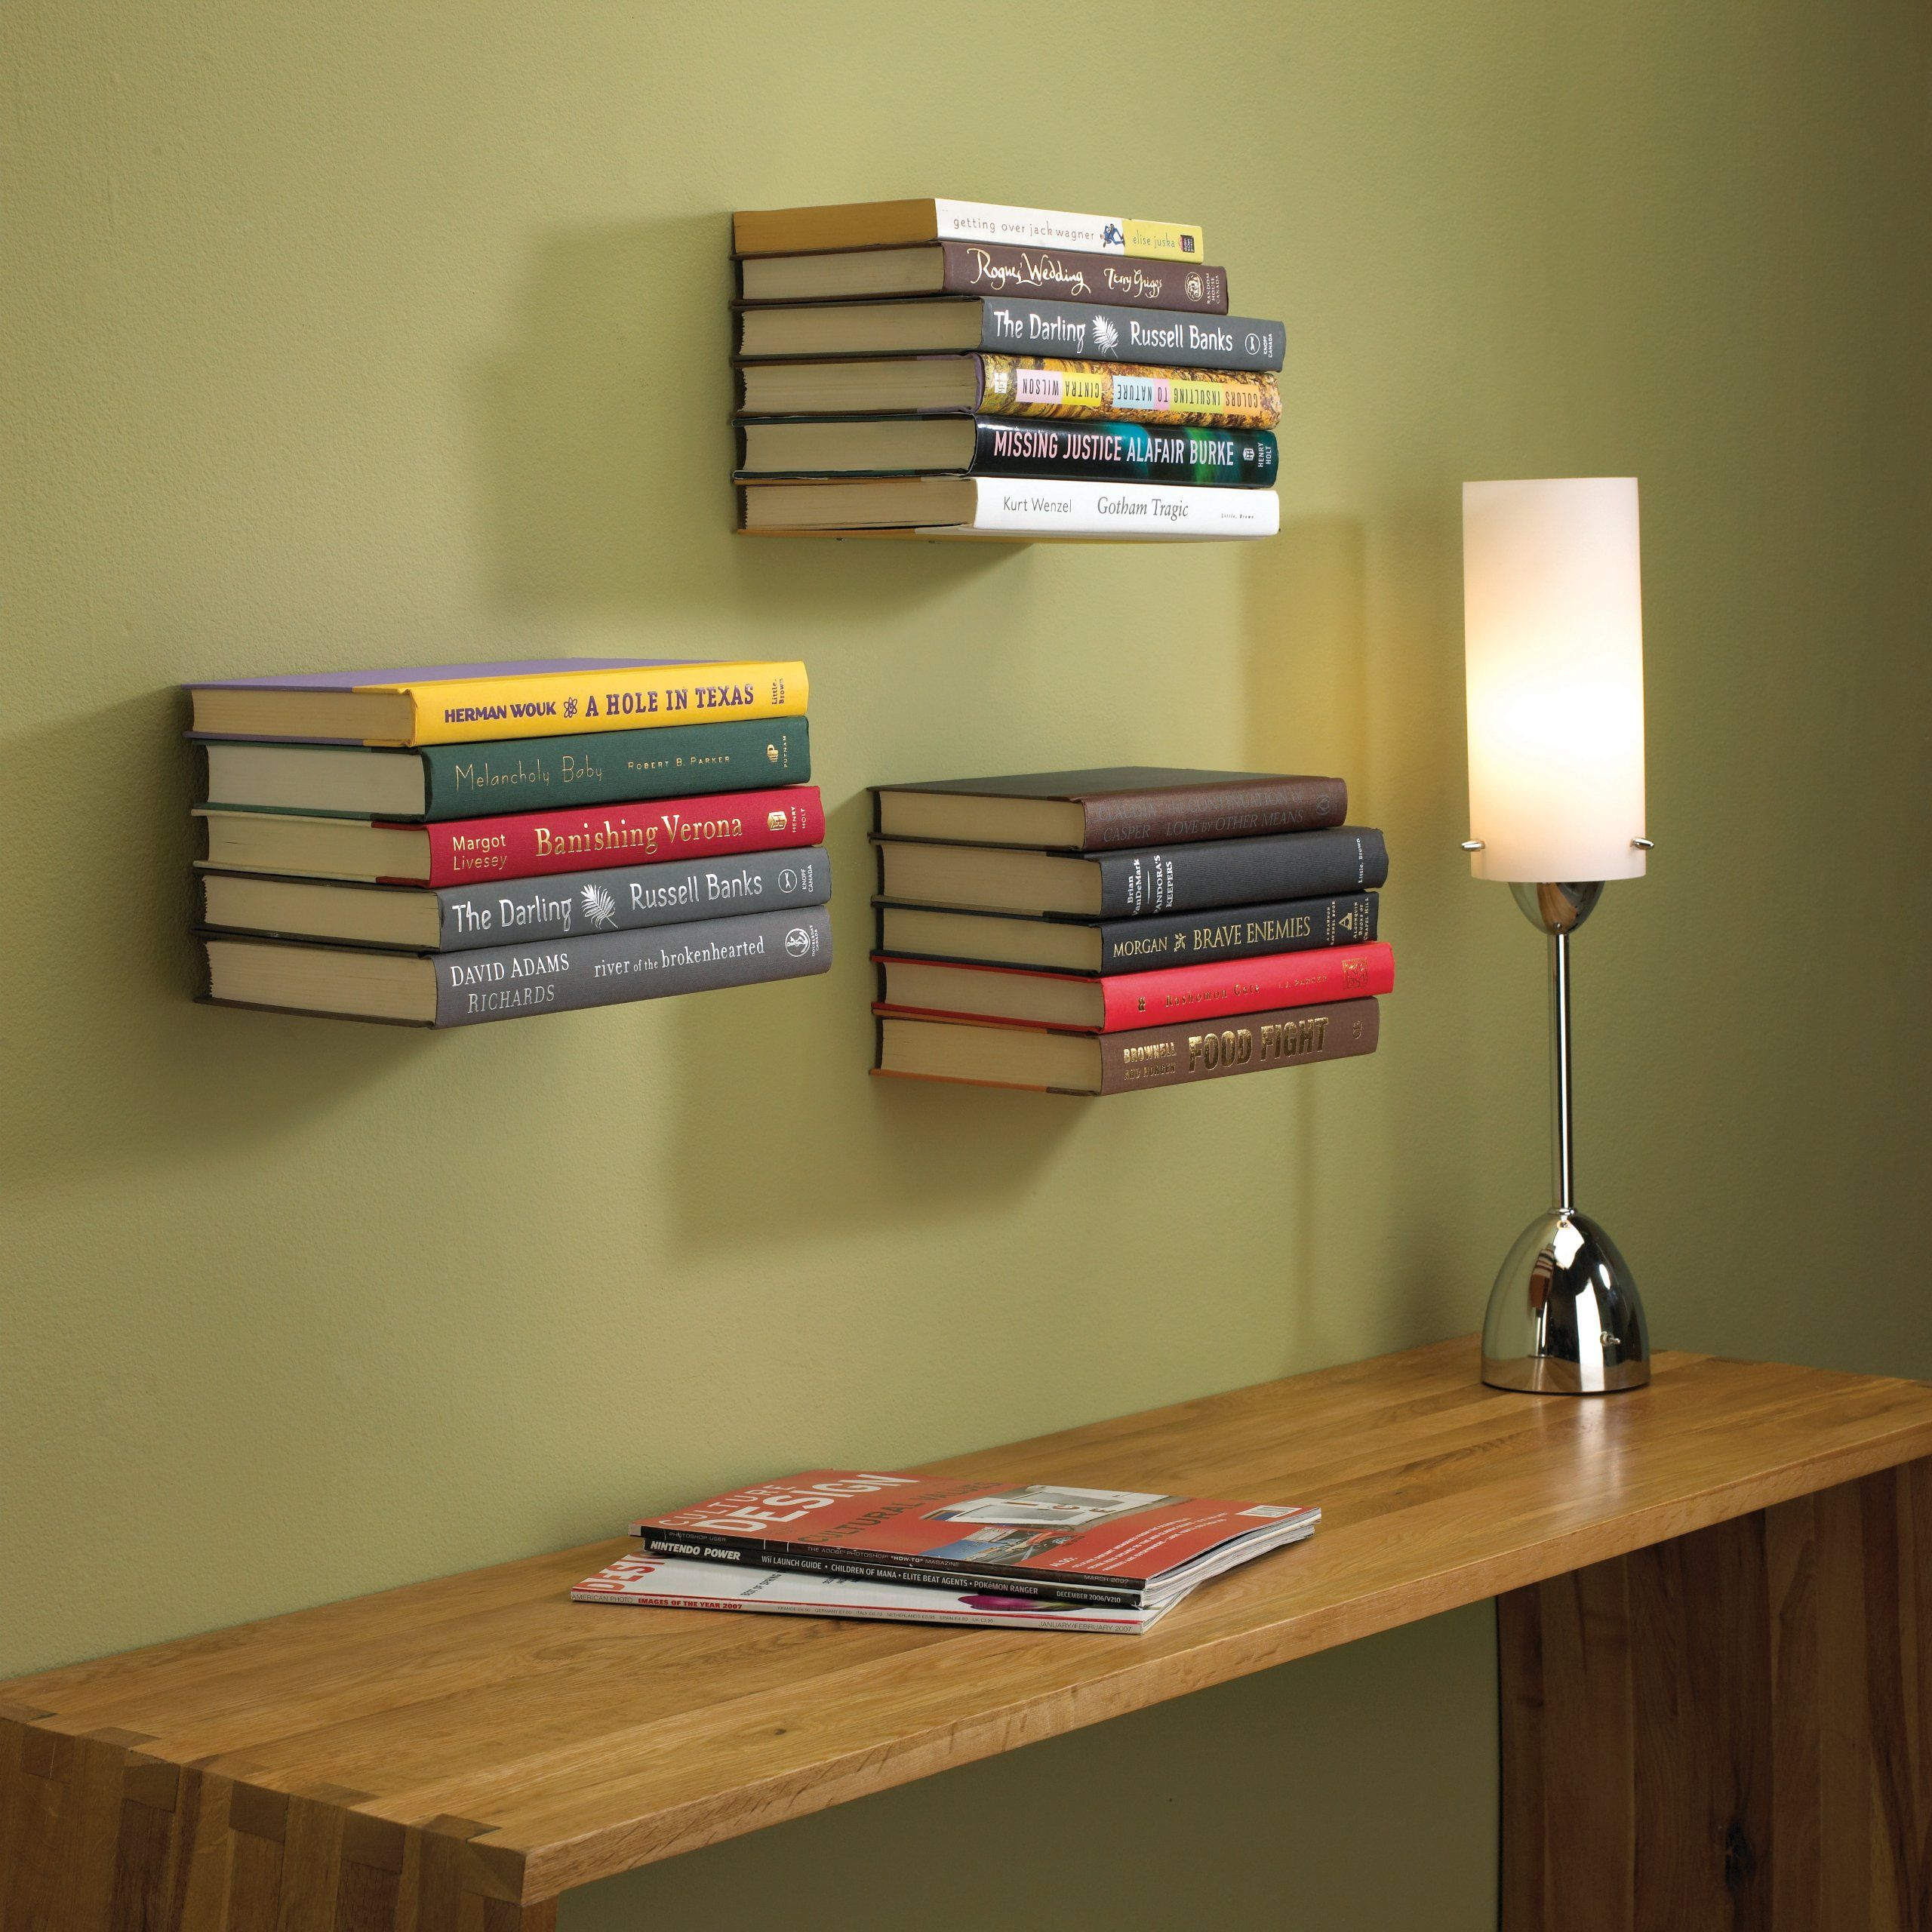 Amazonsmile Umbra Conceal Floating Book Shelf Large Silver Floating Shelves Scaffali Sospesi Design Scaffali Idee Scaffale